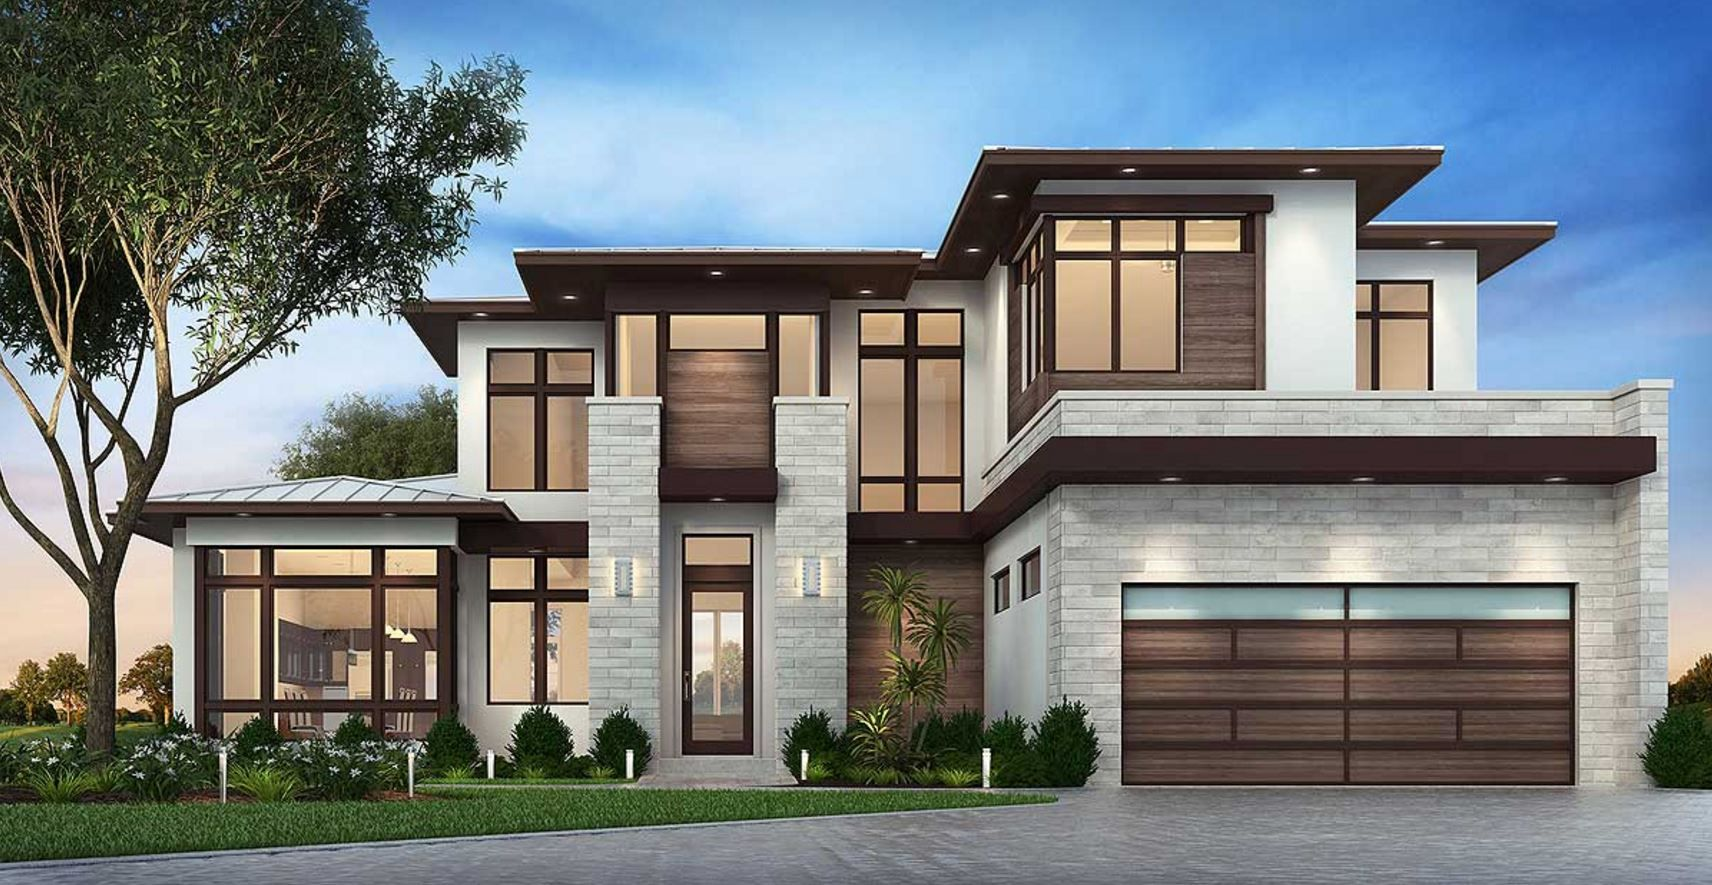 Casa moderna de 350 metros cuadrados casas de ensue o for Casa moderna 9 mirote y blancana